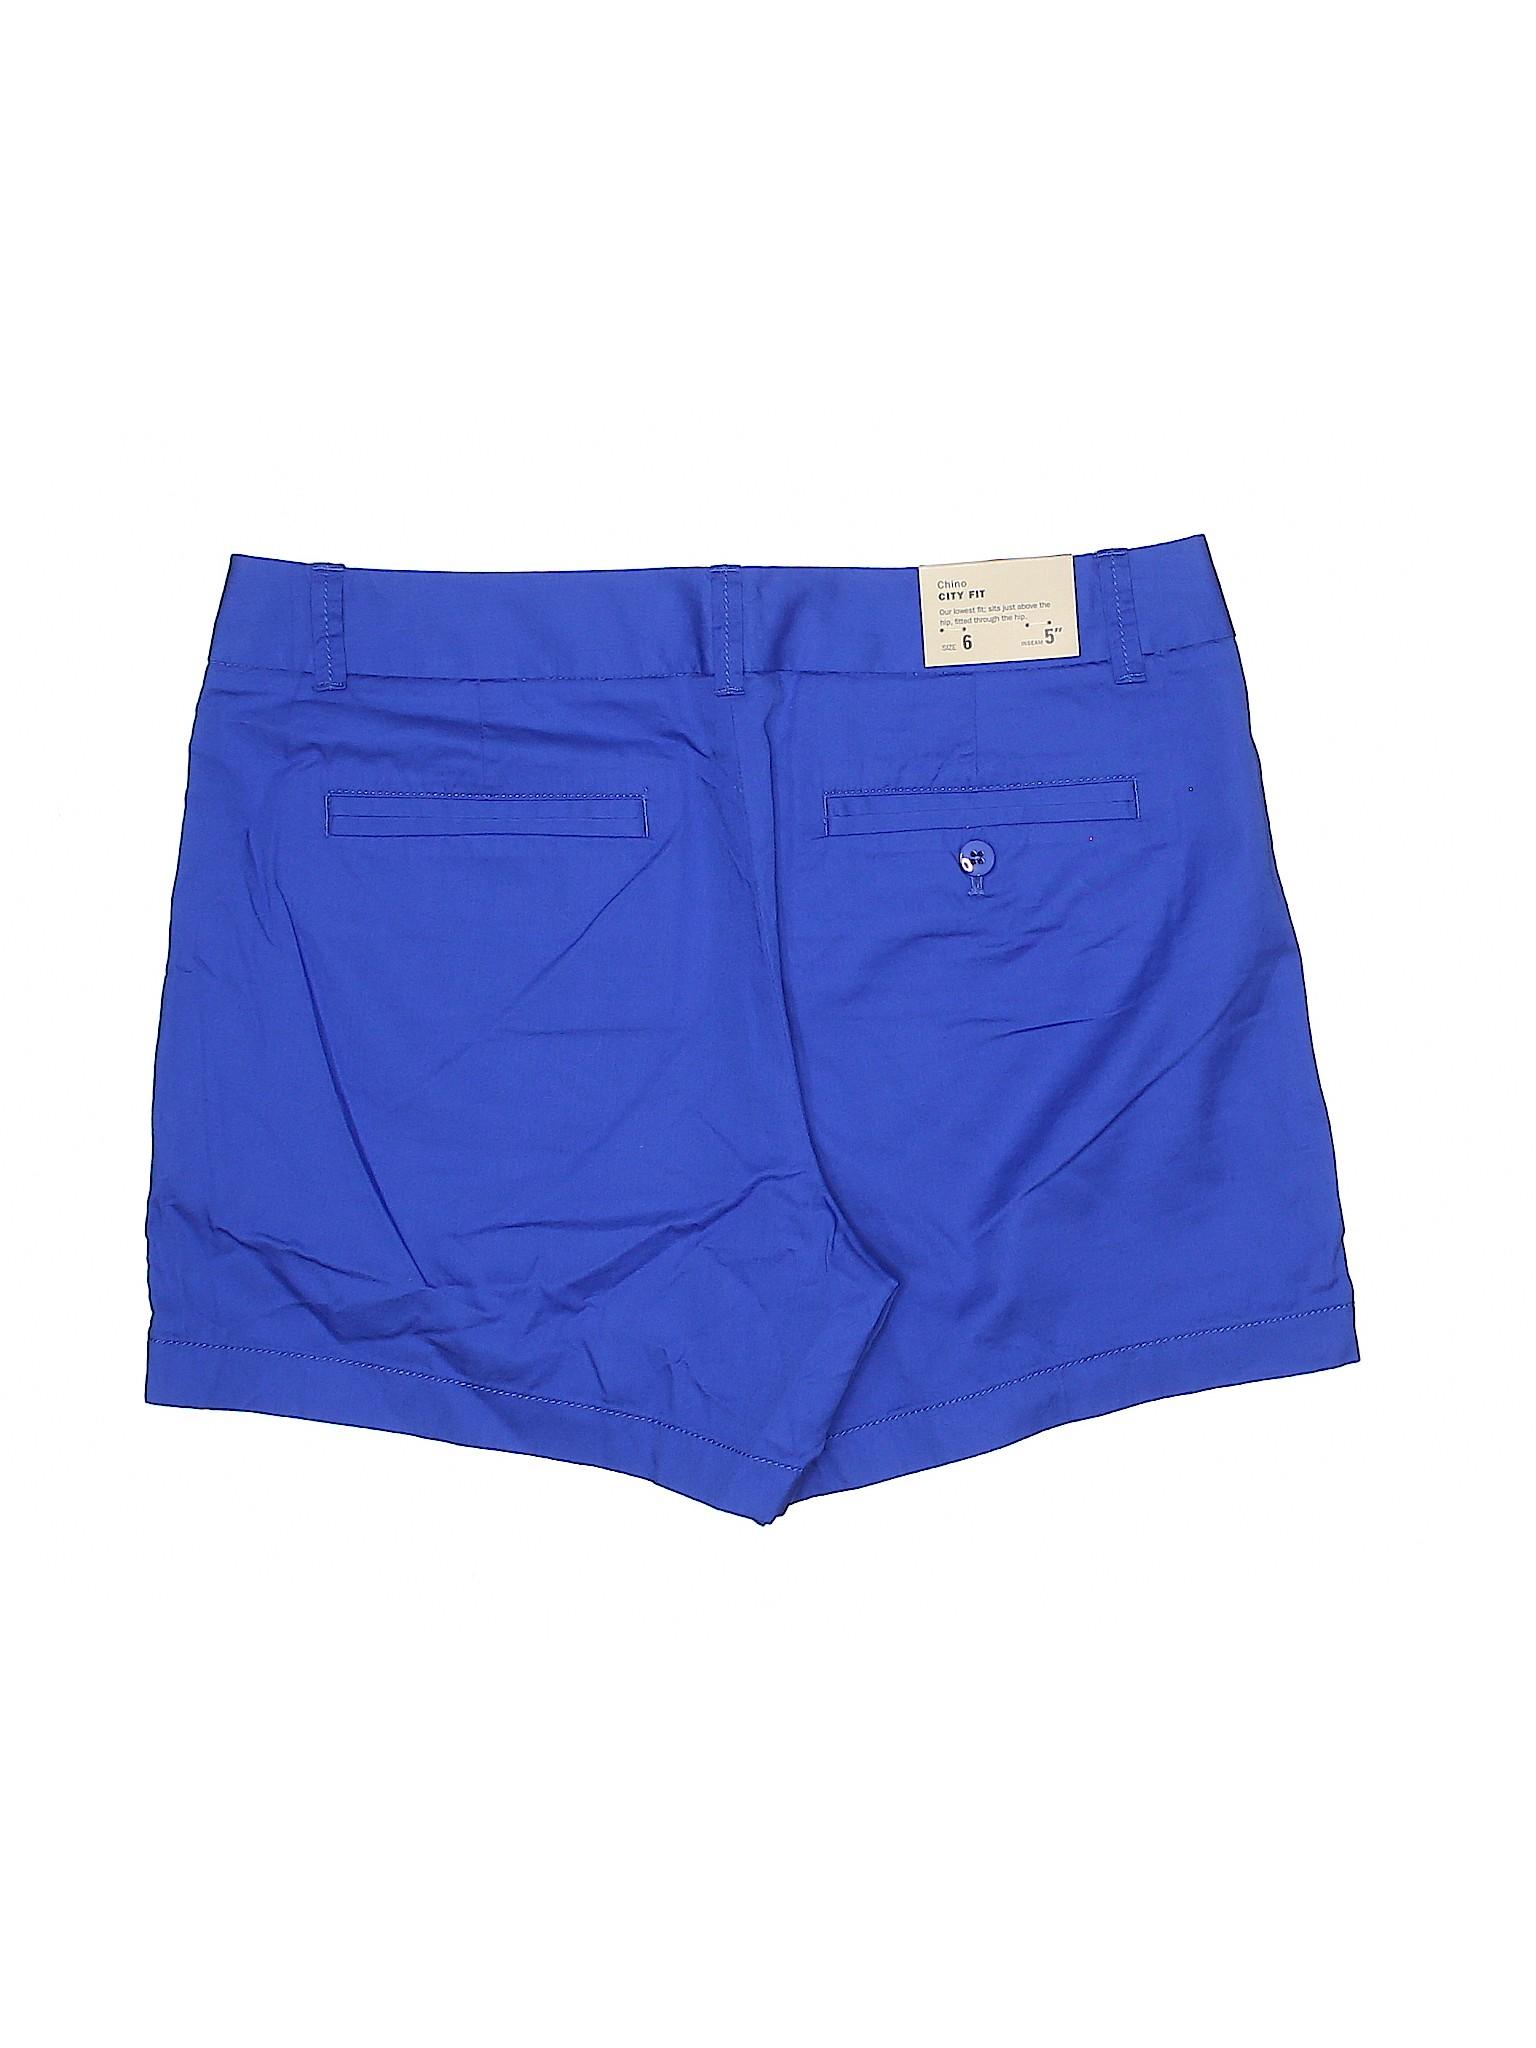 J Shorts Factory Store Crew Khaki Boutique YFf8Txx